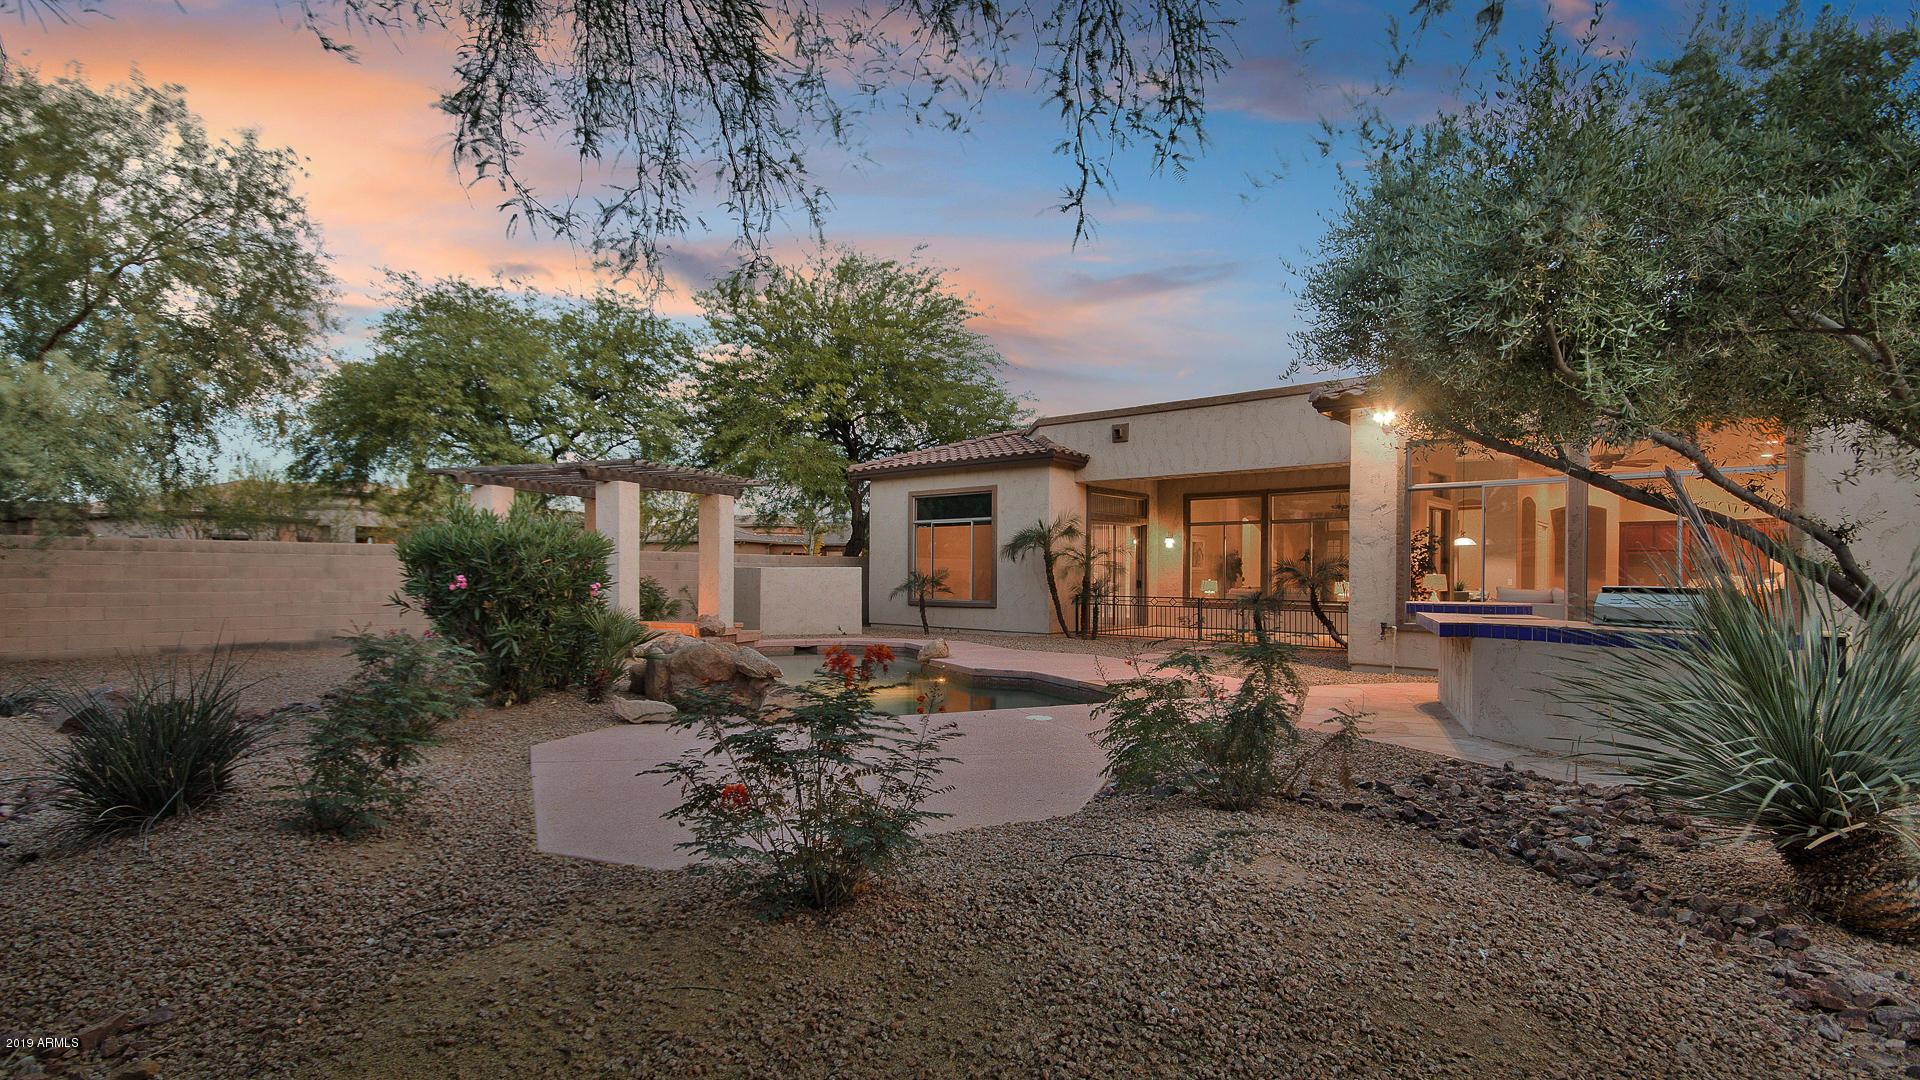 MLS 5863770 3220 E CEDAR Drive, Chandler, AZ 85249 Chandler AZ Mesquite Grove Estates